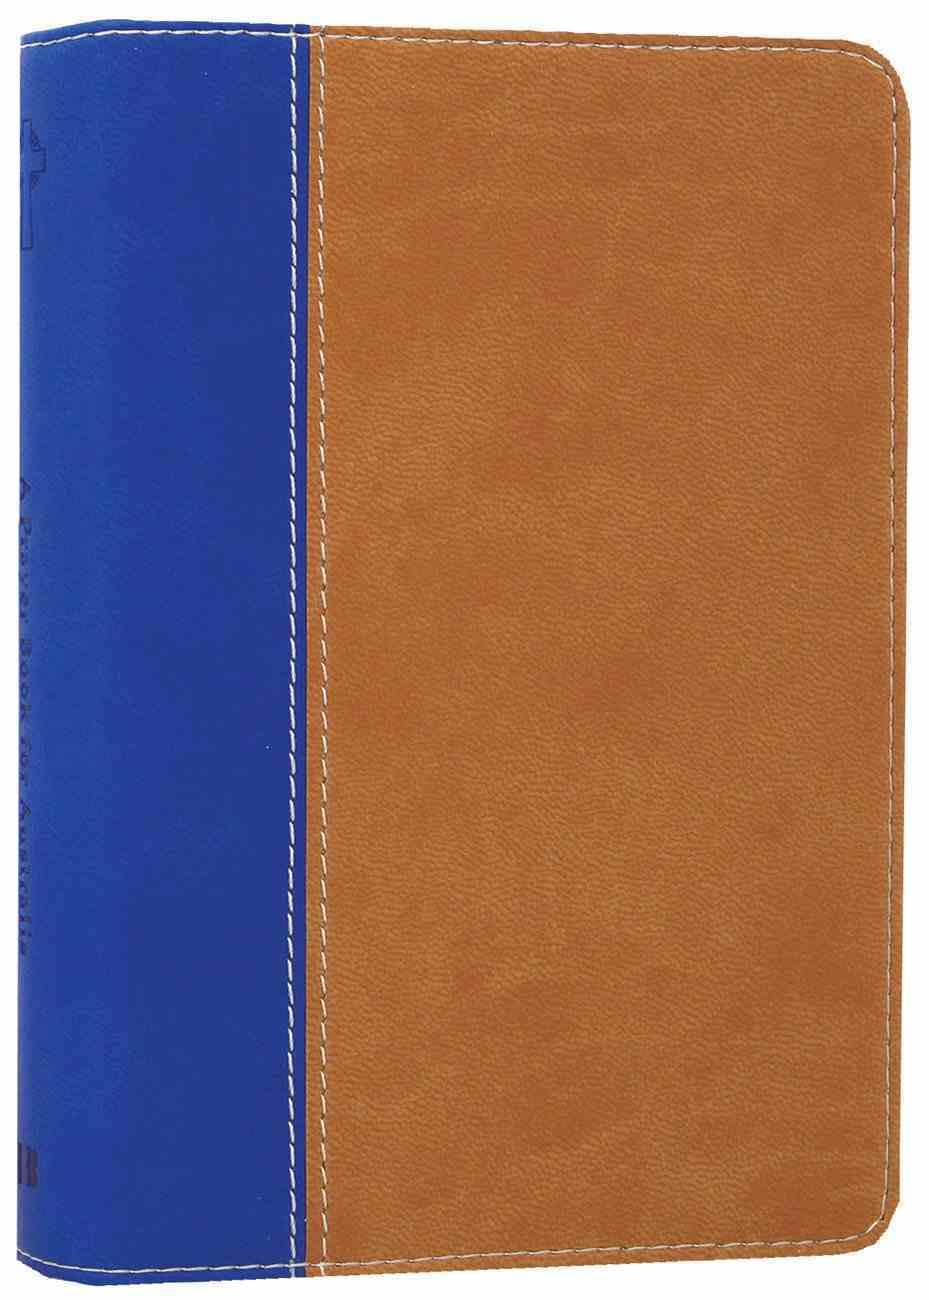 Apba a Gift Prayer Book (A Prayer Book For Australia) Imitation Leather